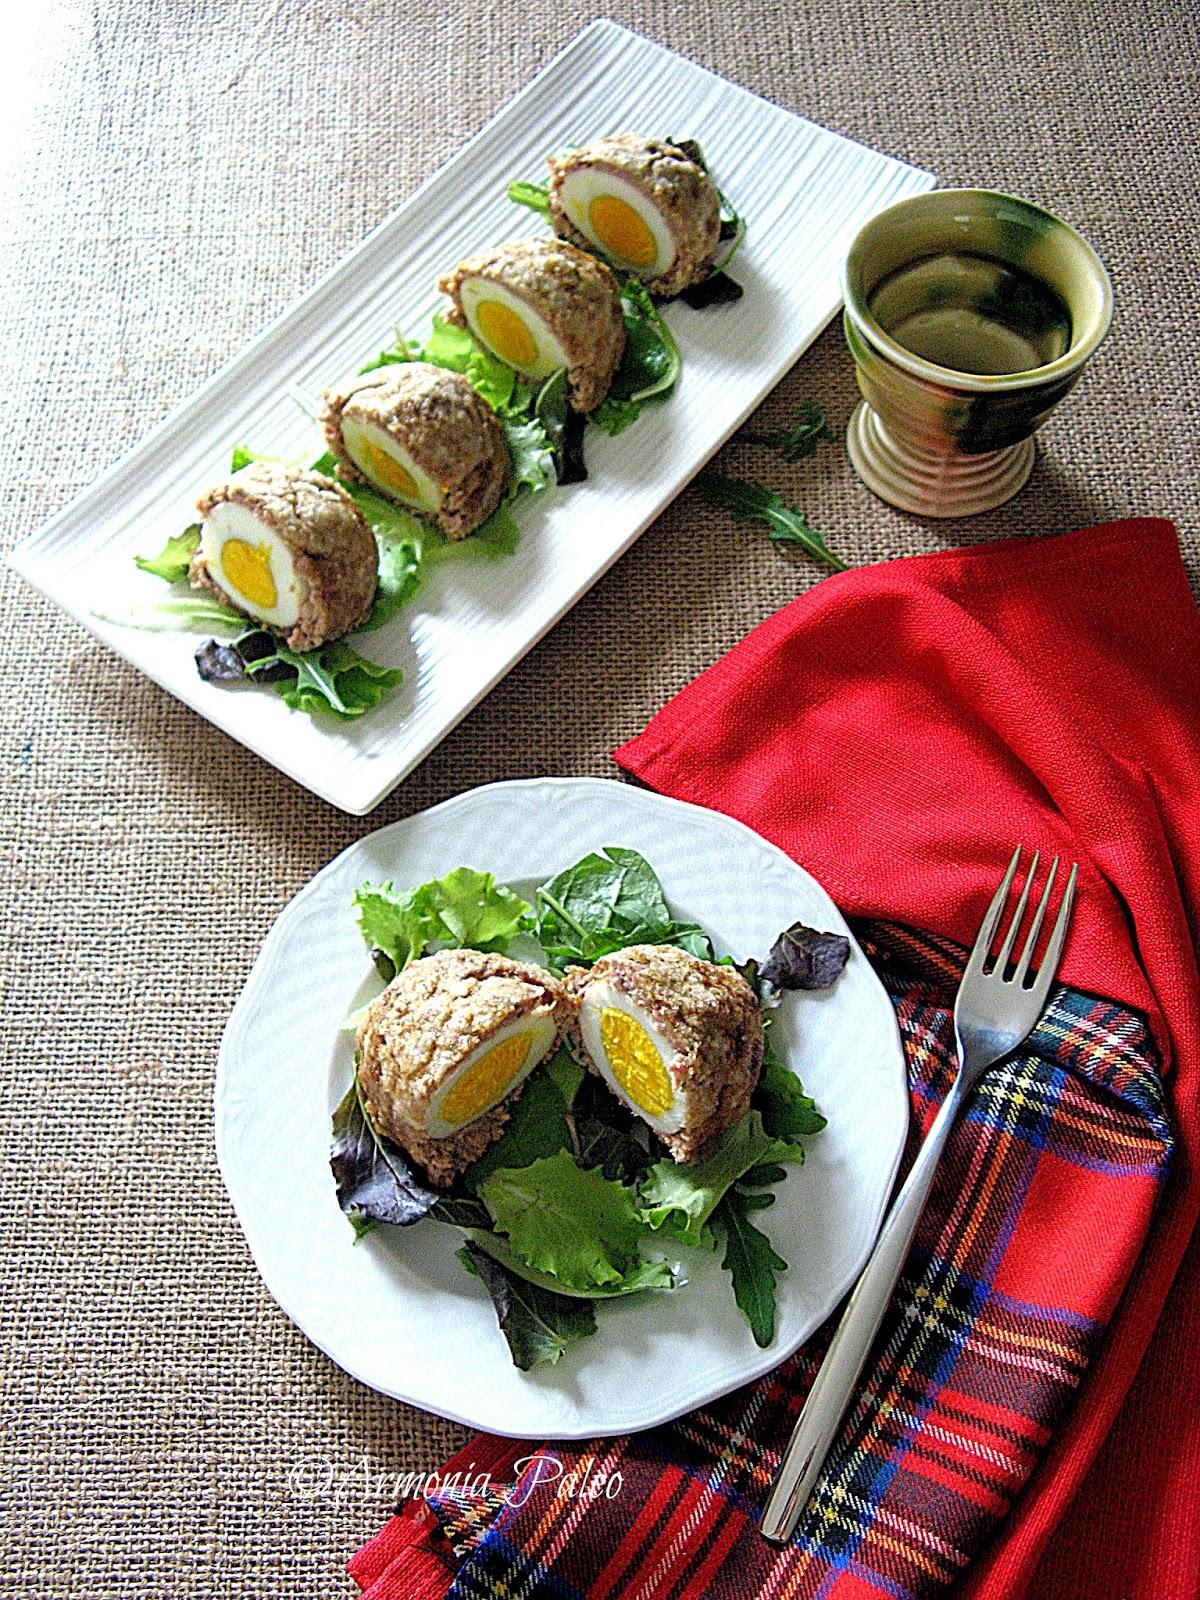 Scotch Eggs - Uova Scozzesi di Armonia Paleo